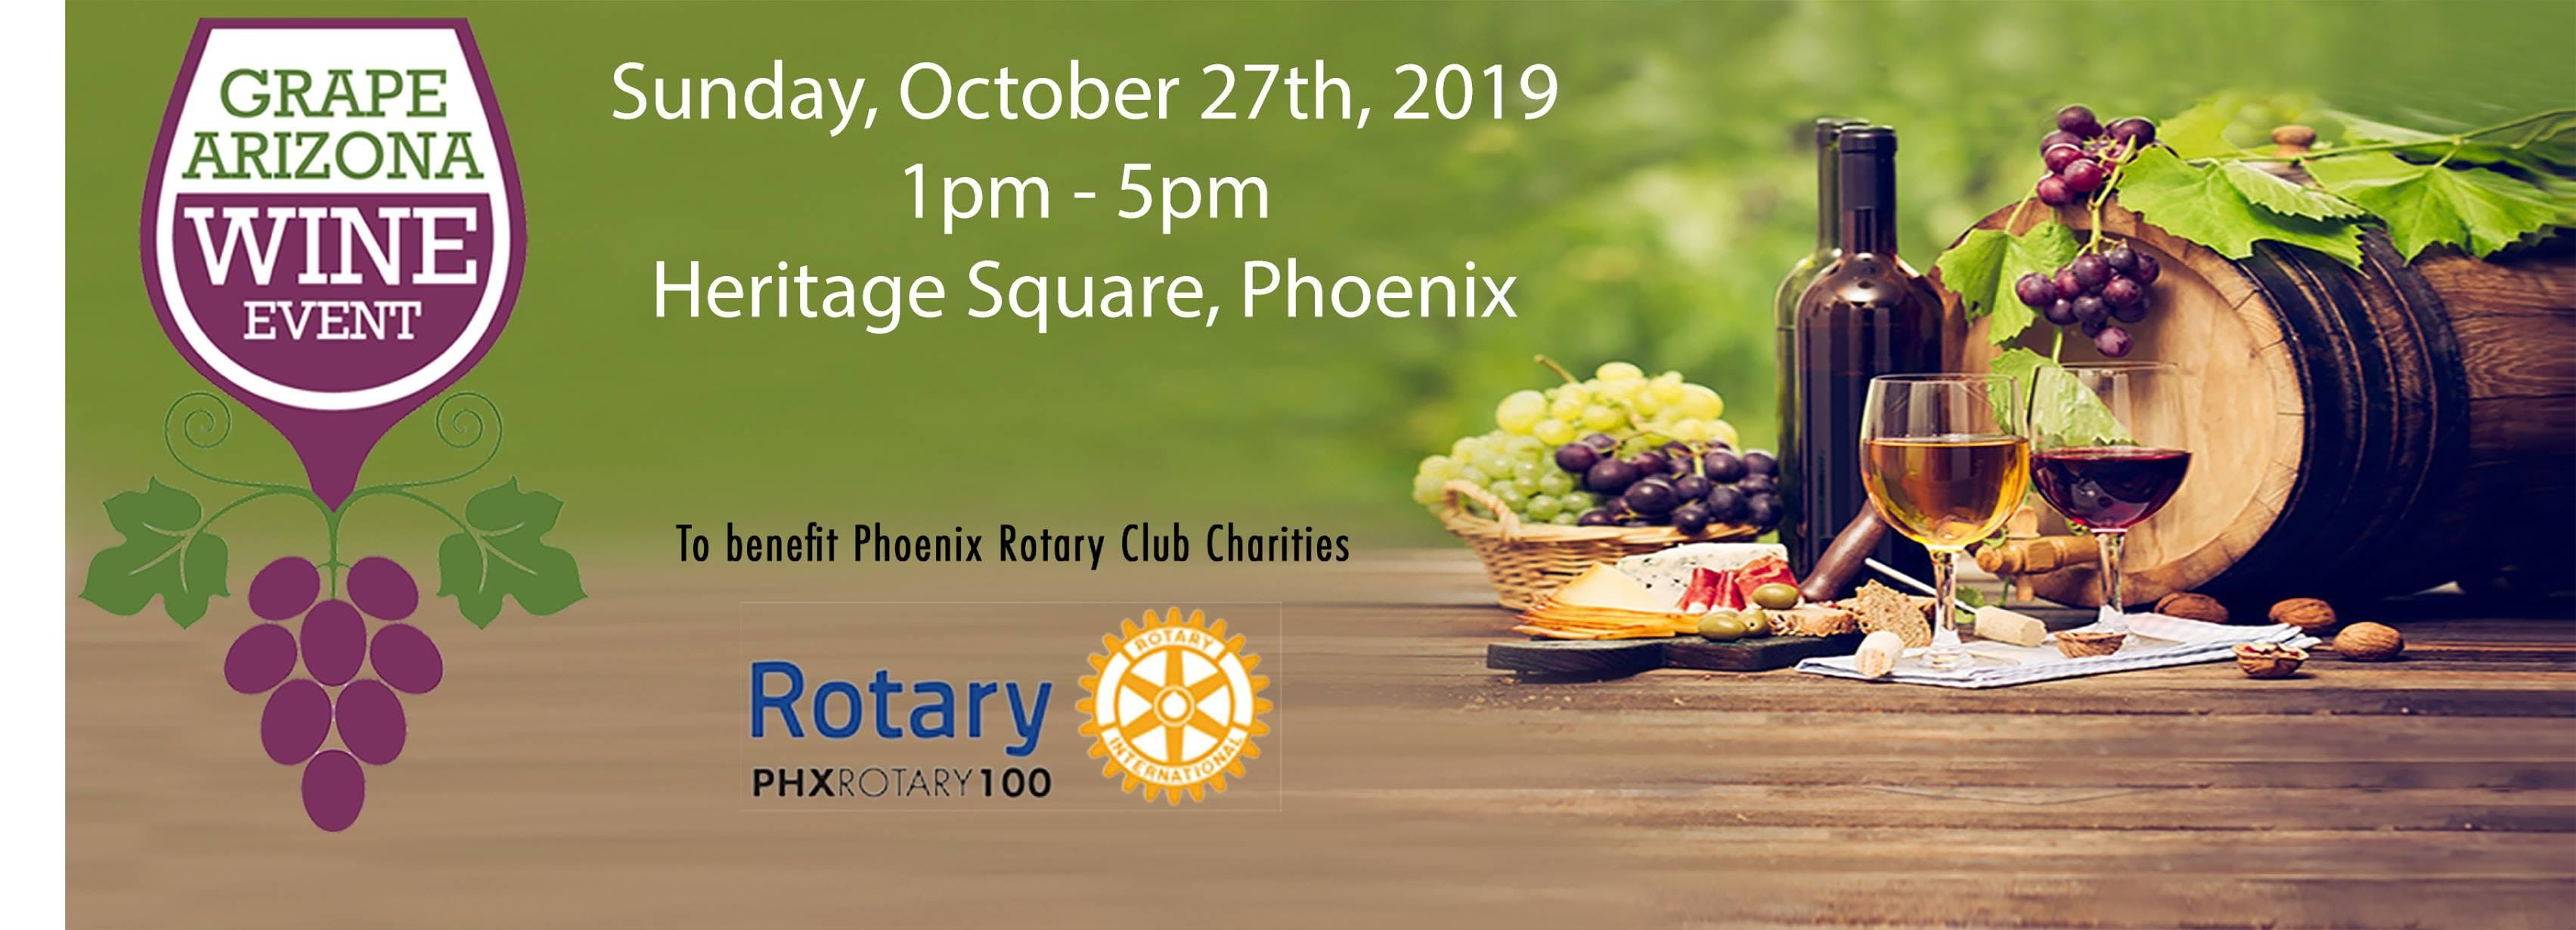 Grape Arizona Wine Event |Fall 2019 |(Charity) Wine, Beer, & Food Festival